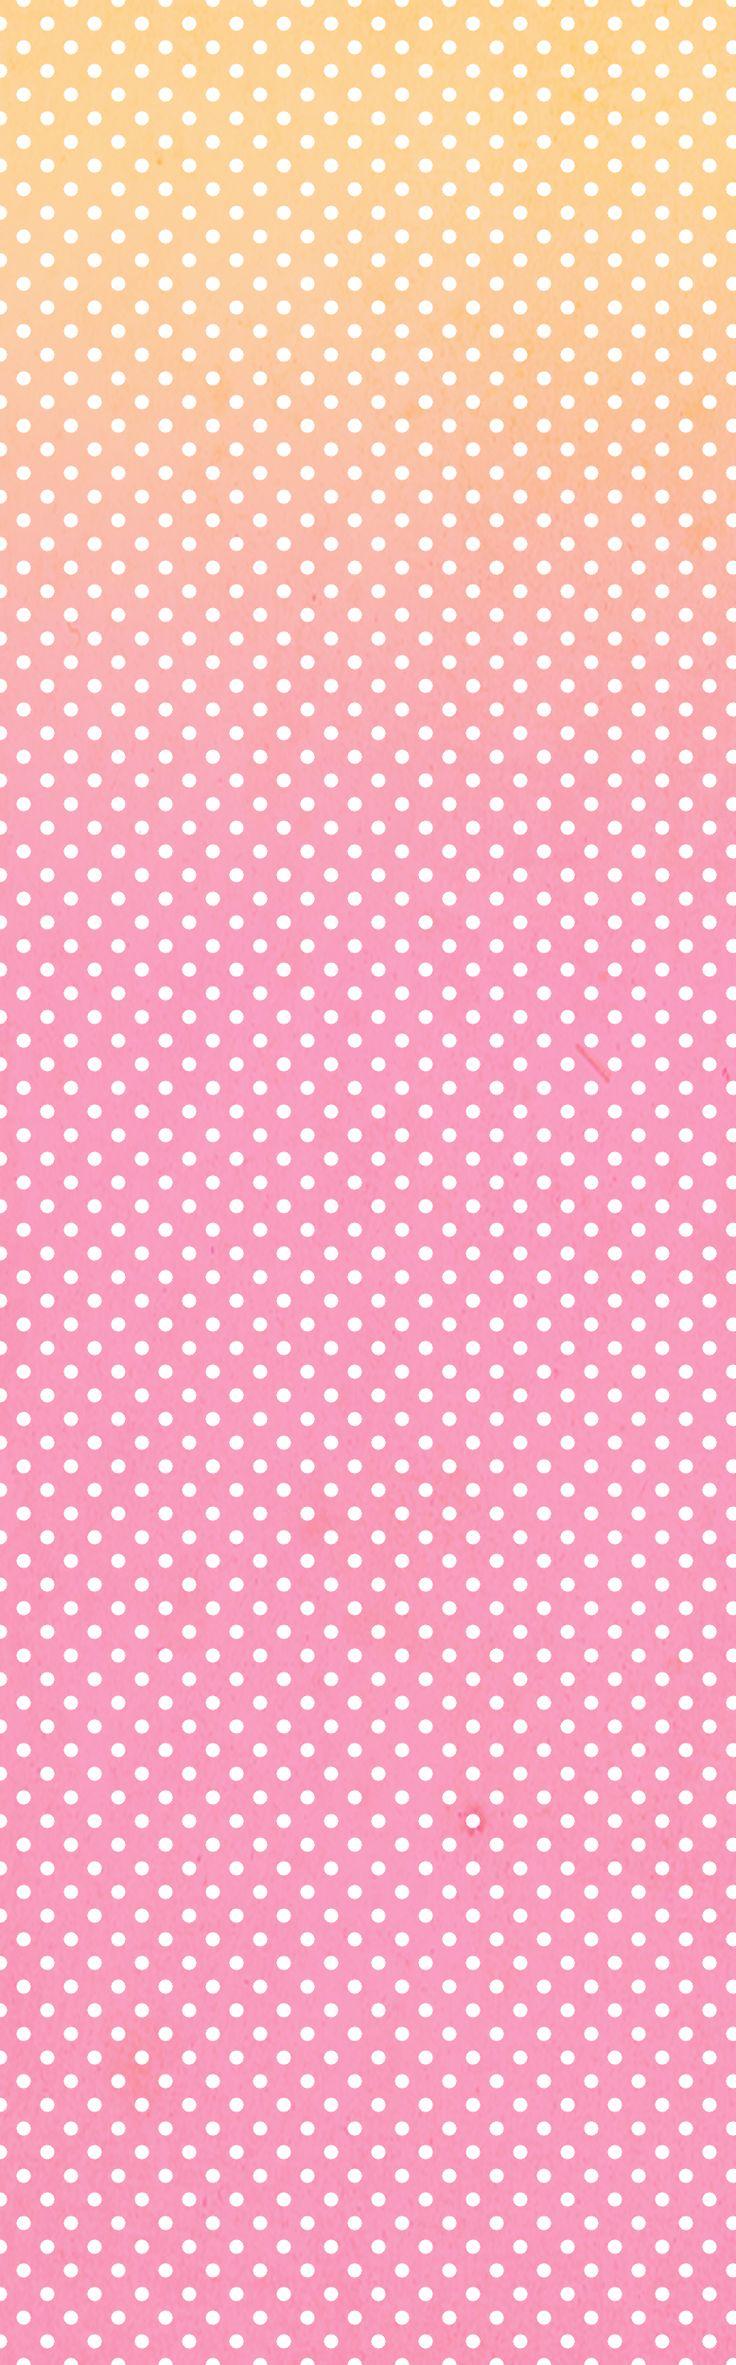 Polka-Dot CustomBox Background by Demachic.deviantart.com on @DeviantArt